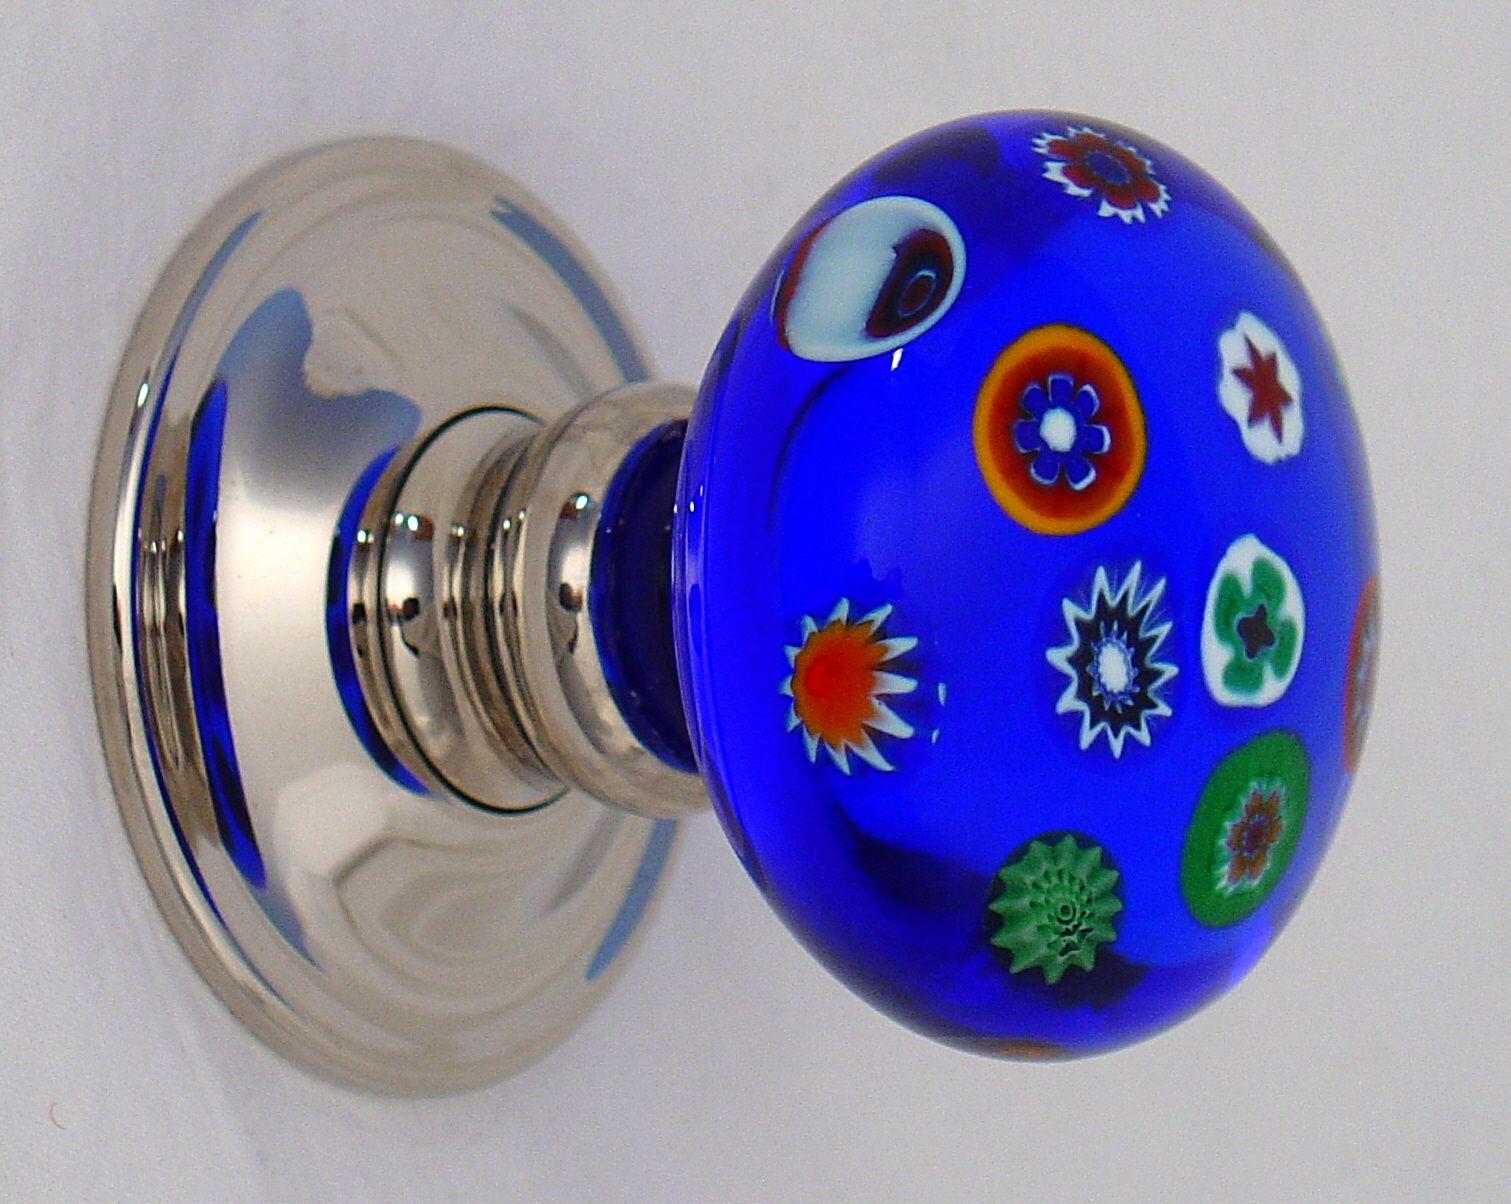 Cobalt Blue Millefiori Glass Door Knob By Merlin Glass